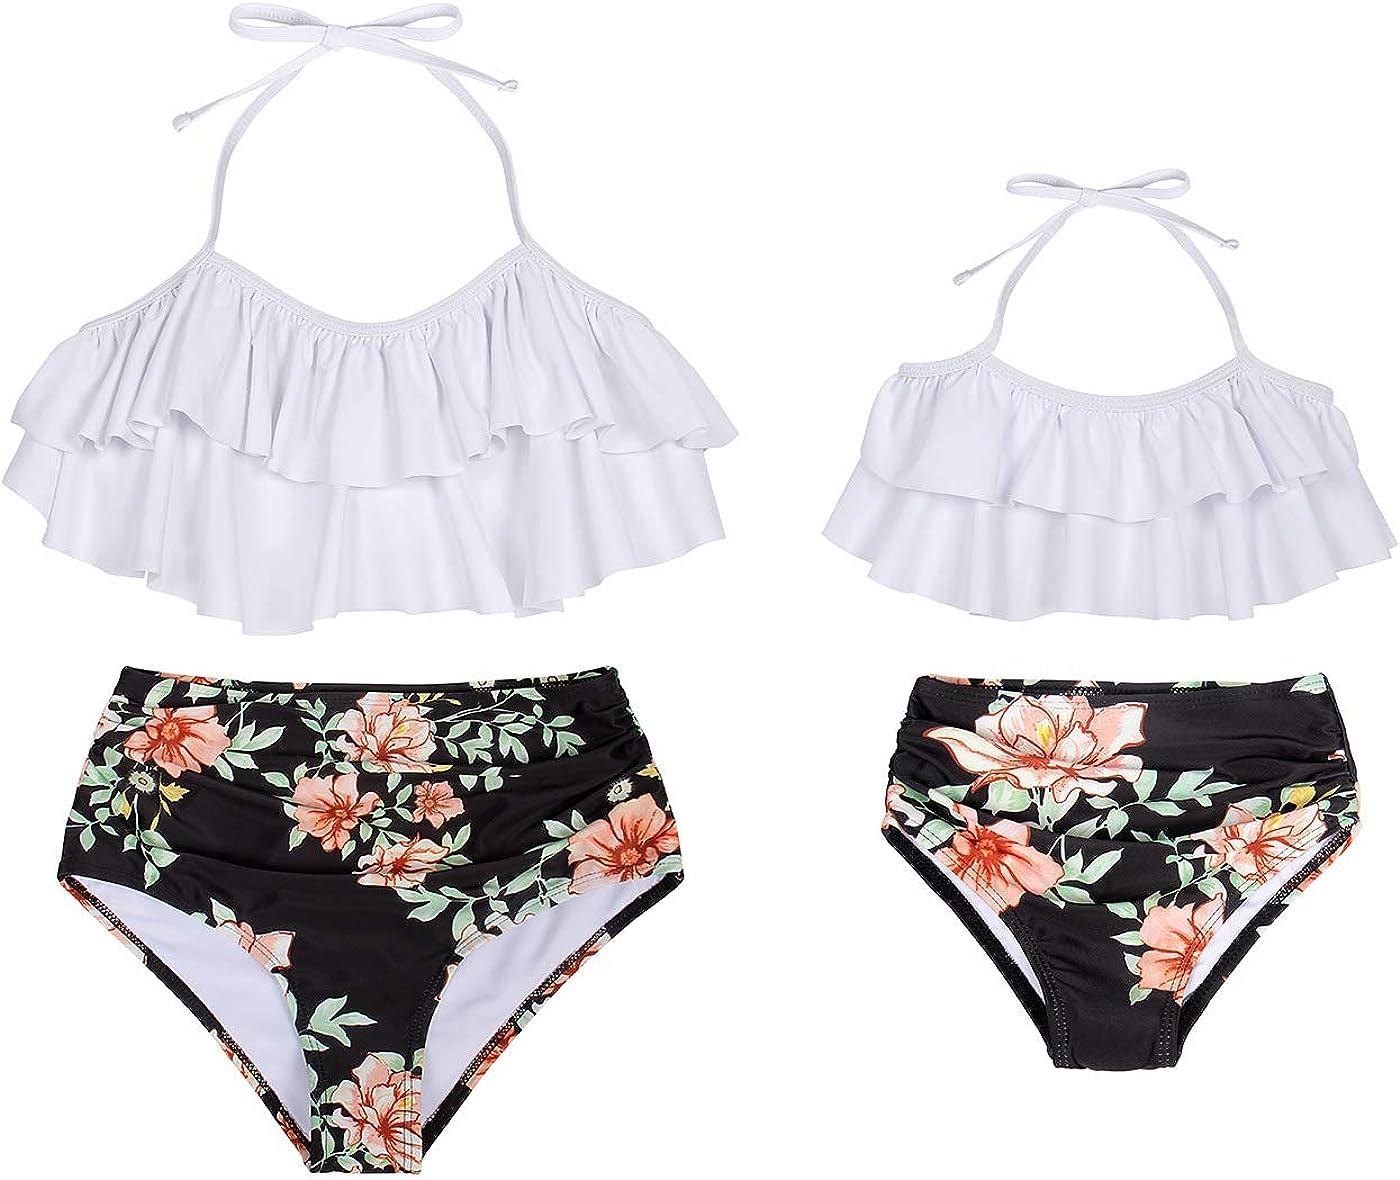 Jurebecia Family Matching Swimwear Two Pieces Bikini Set Printed Ruffles Mommy and Me Bathing Suits